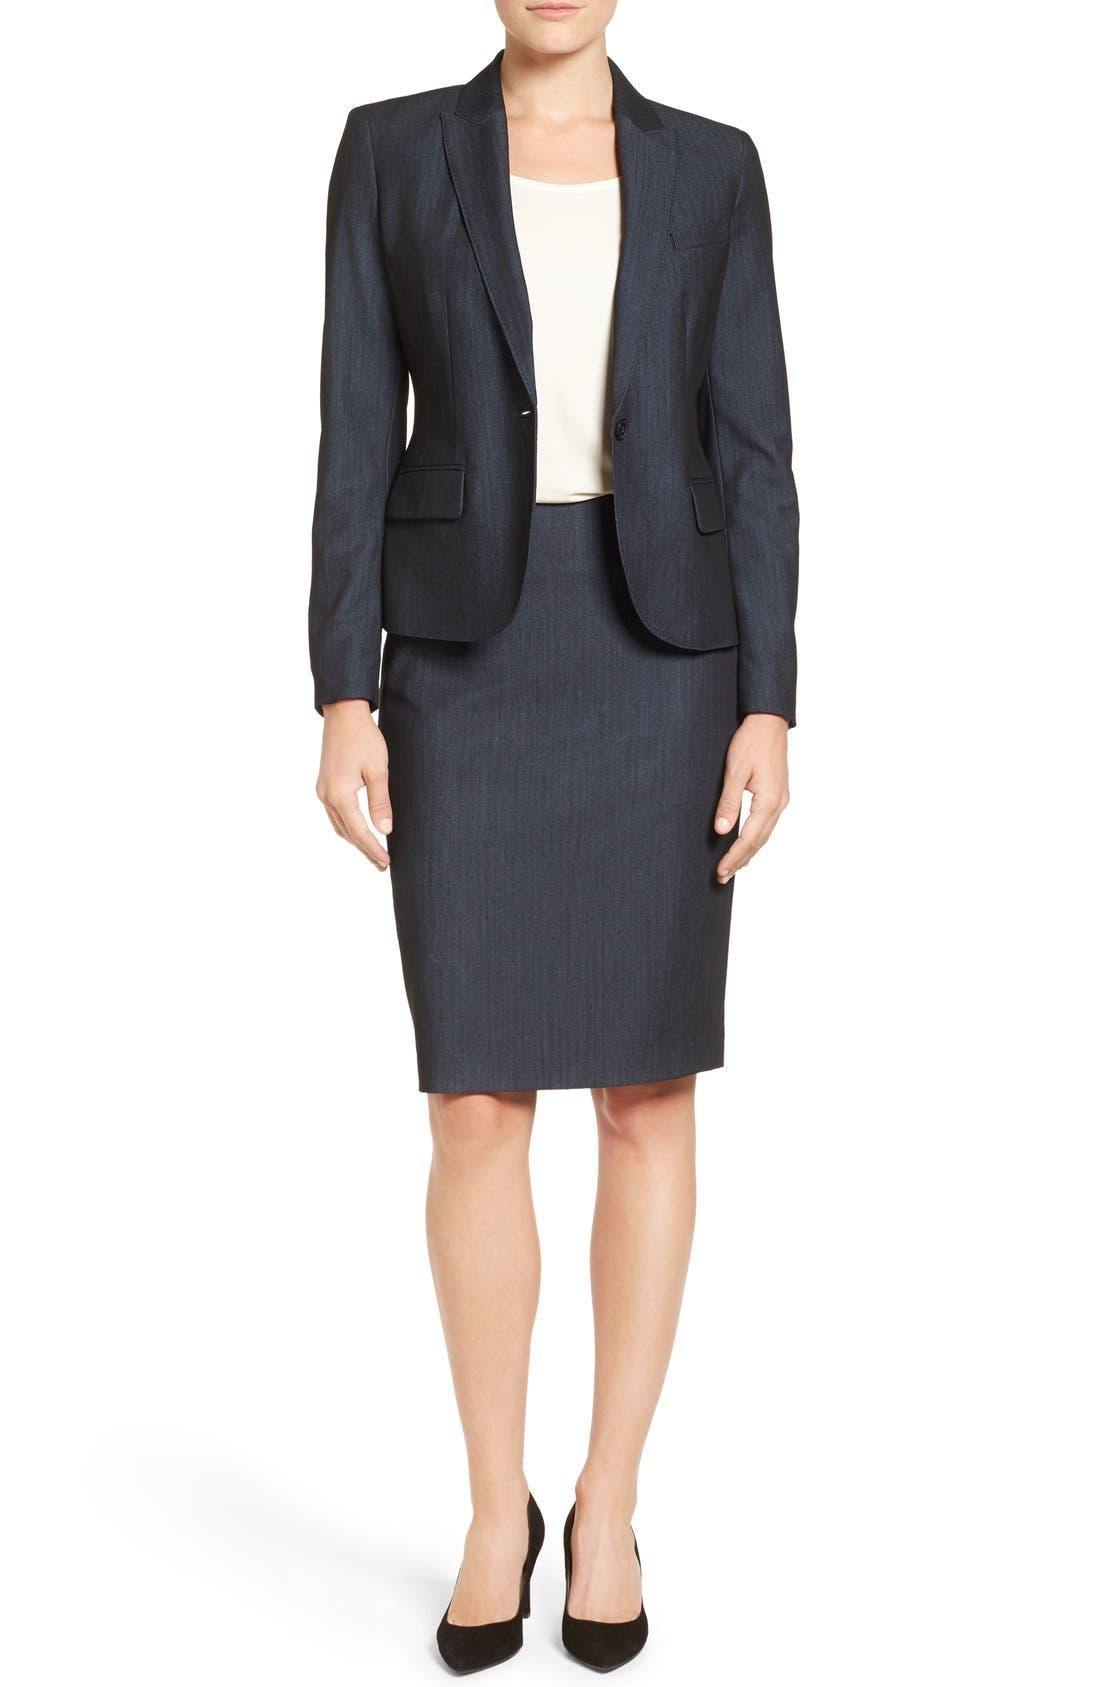 ANNE KLEIN, Stretch Woven Suit Skirt, Alternate thumbnail 3, color, INDIGO TWILL